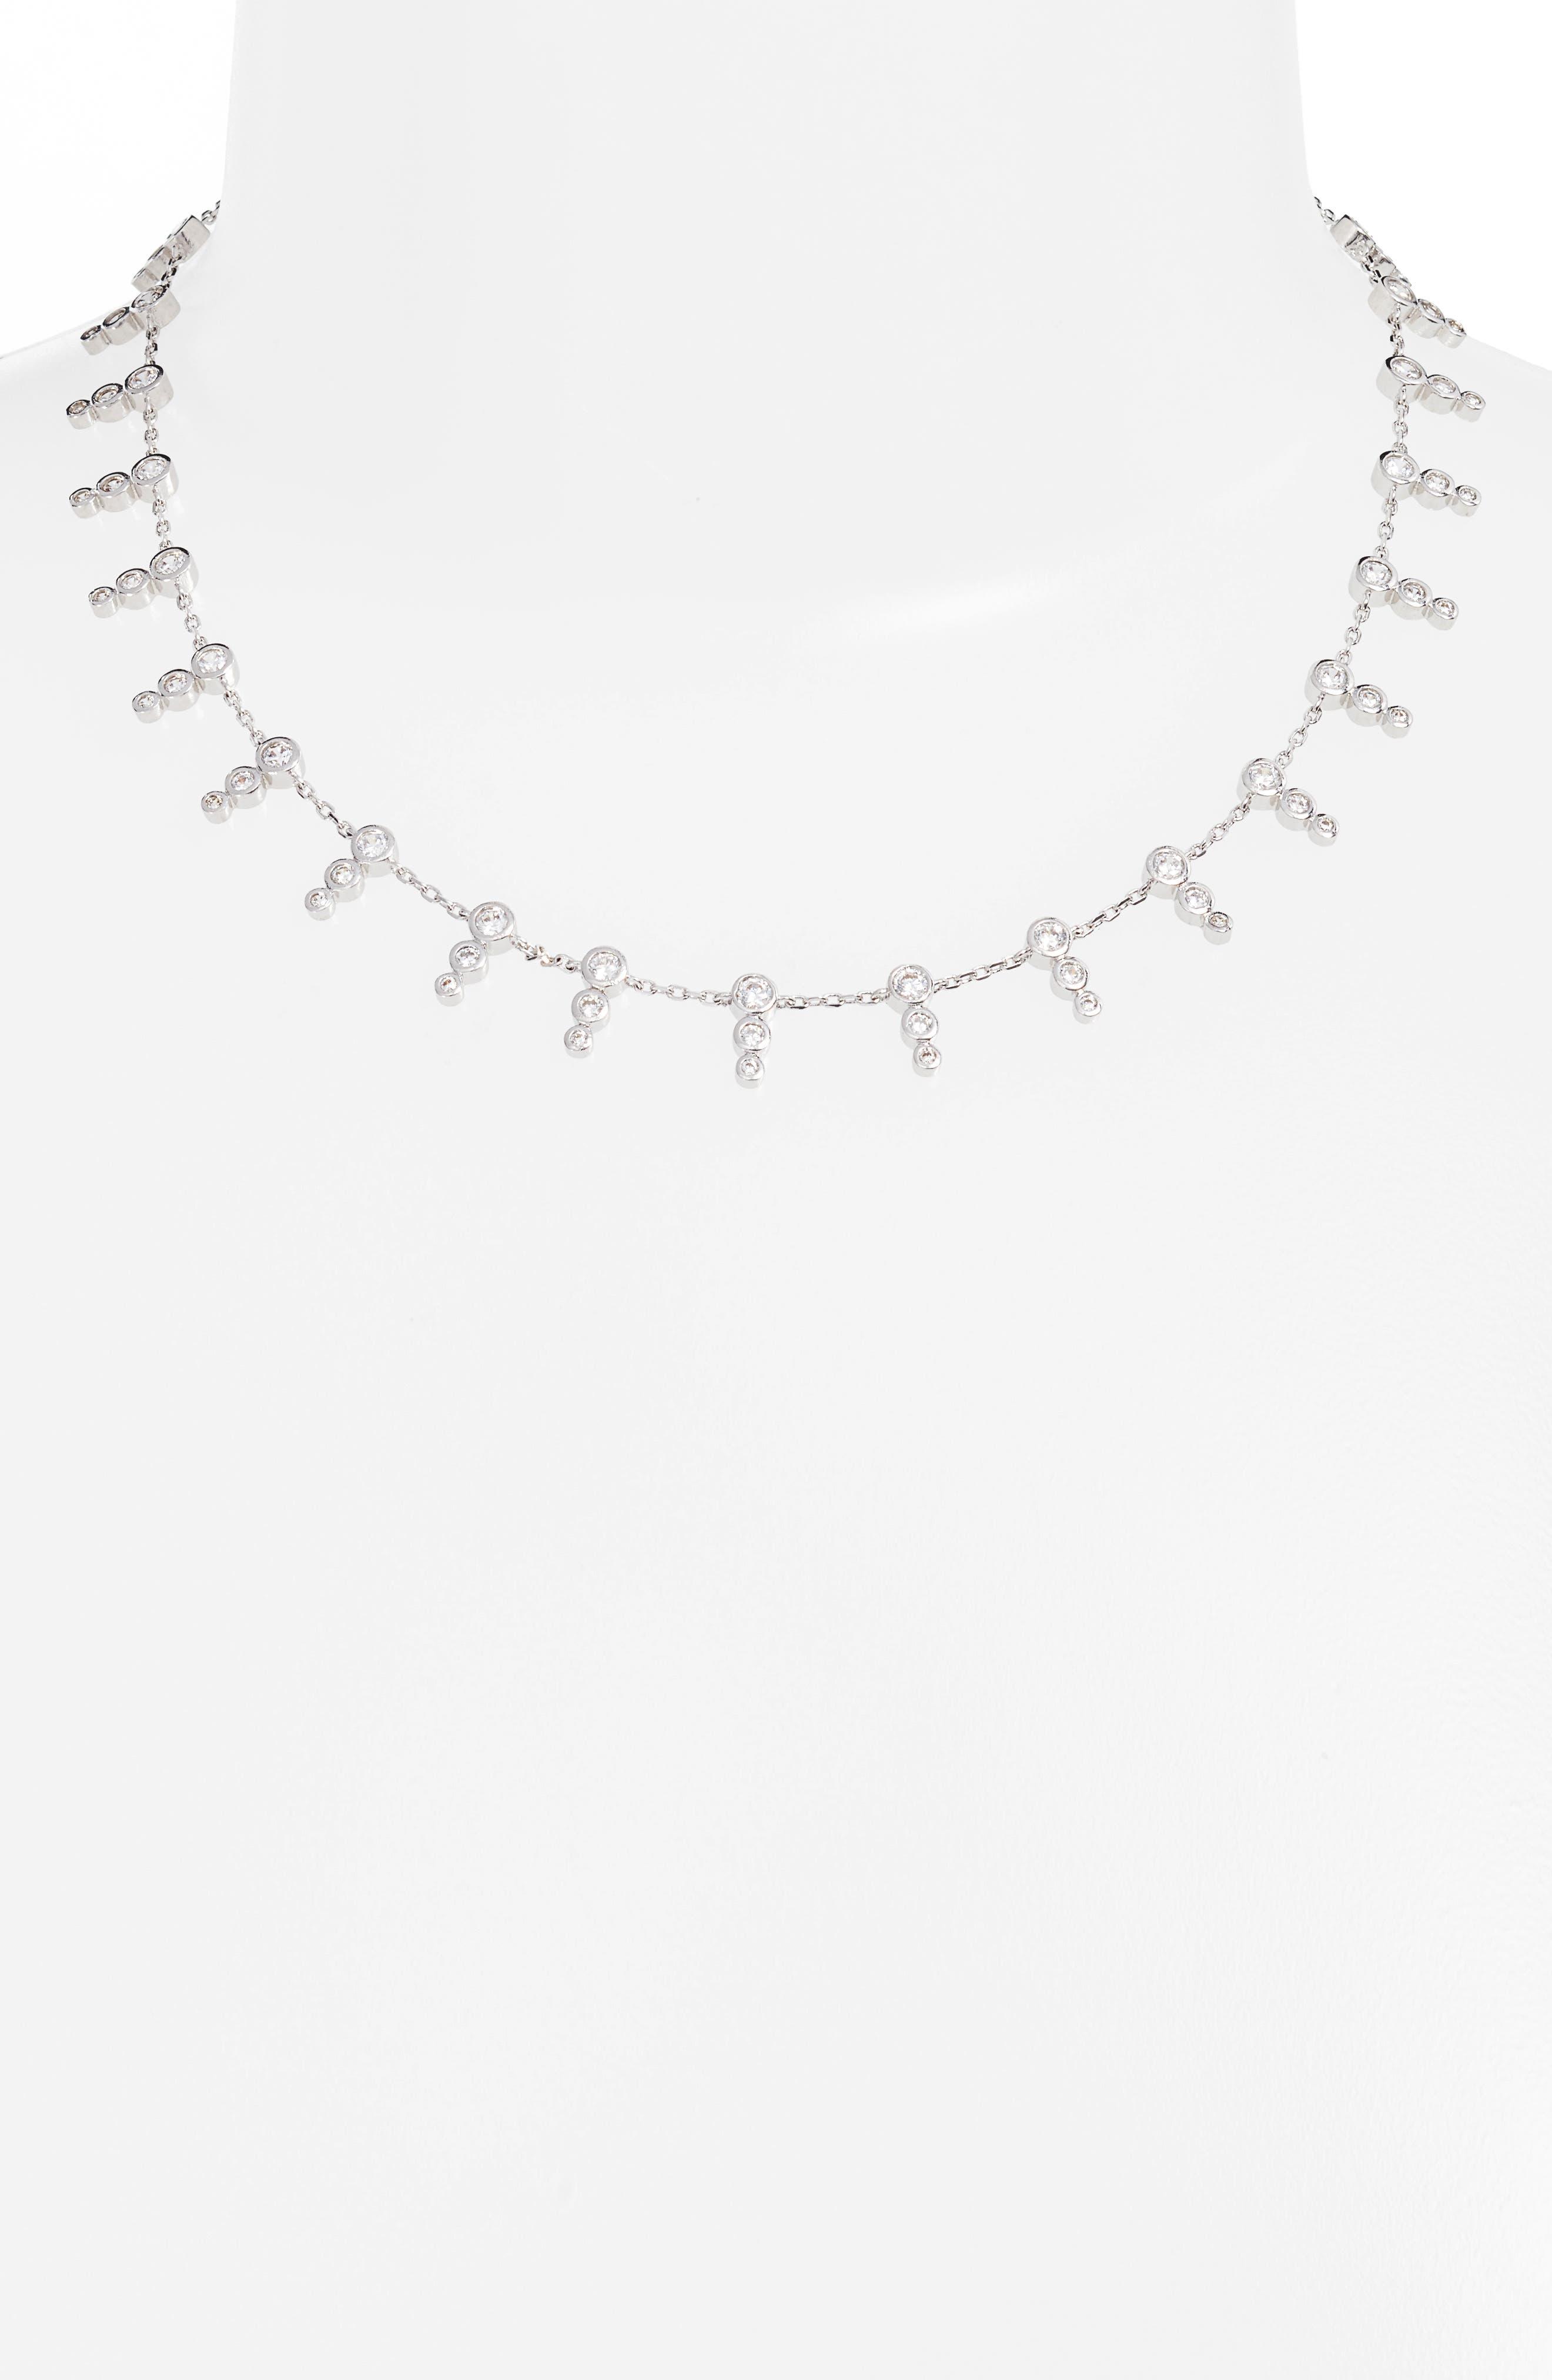 McPhee Cubic Zirconia Collar Necklace,                             Alternate thumbnail 2, color,                             041